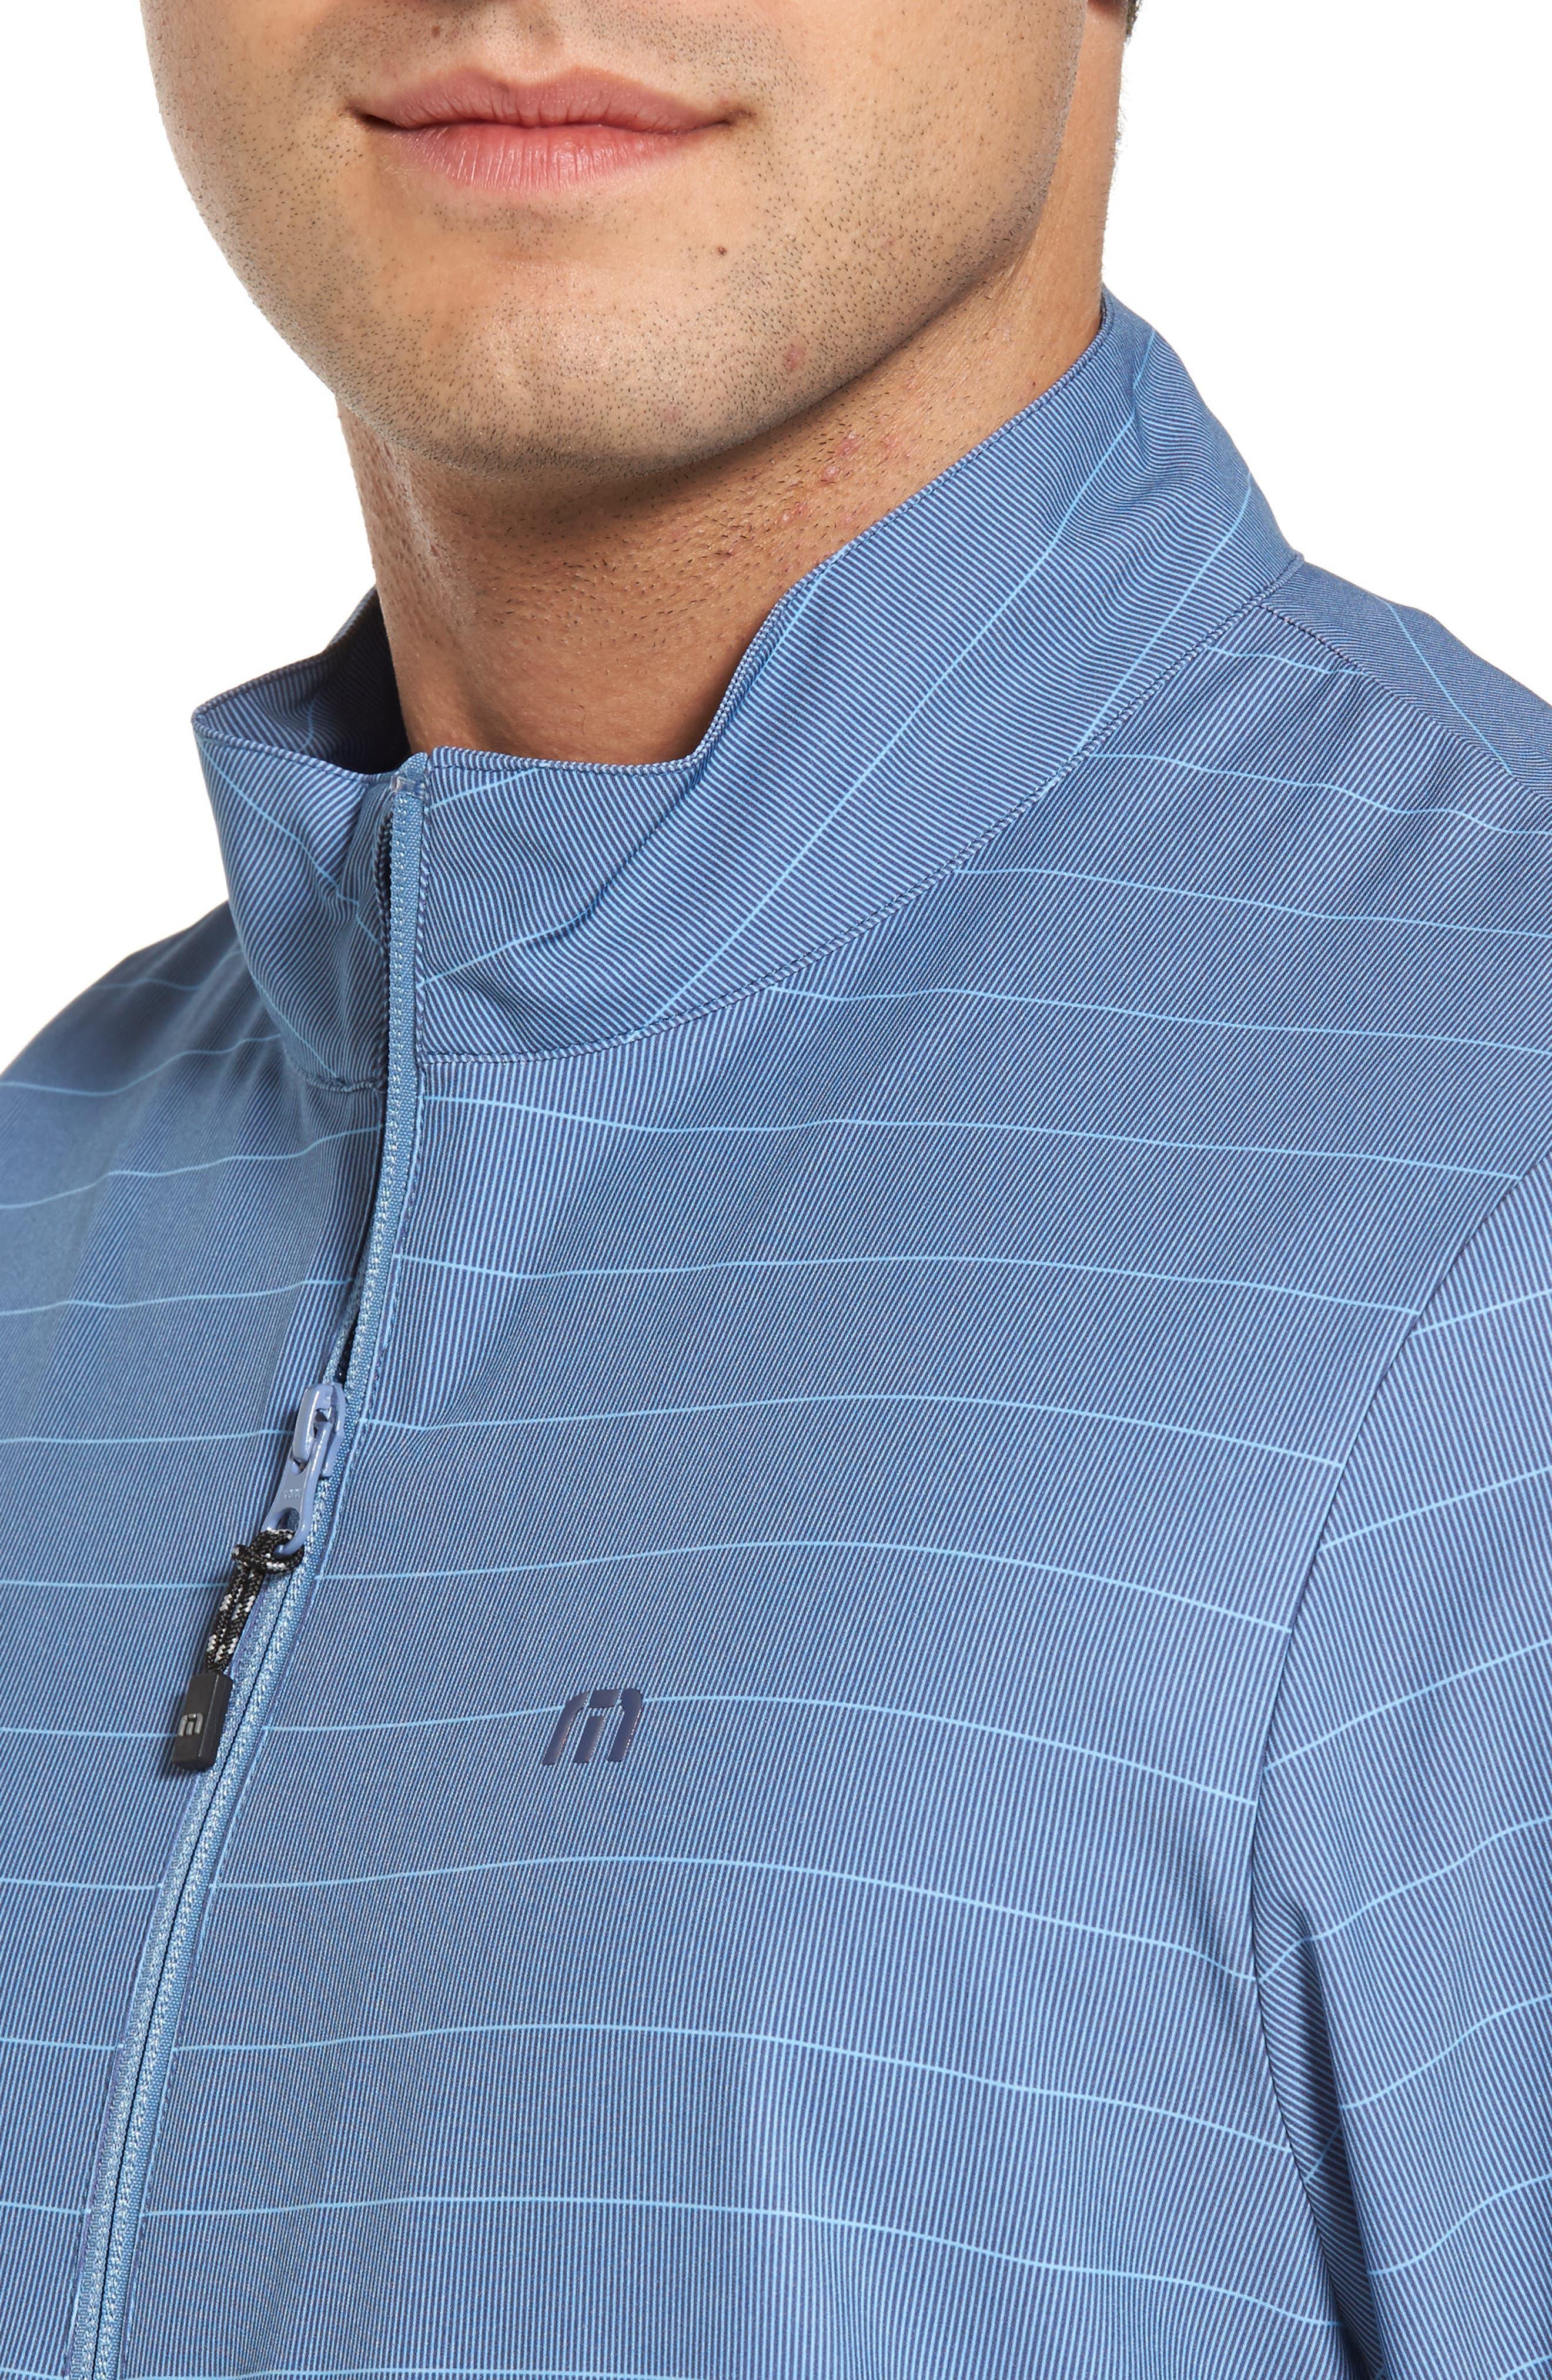 Dubes Quarter Zip Pullover Jacket,                             Alternate thumbnail 4, color,                             Blue Indigo